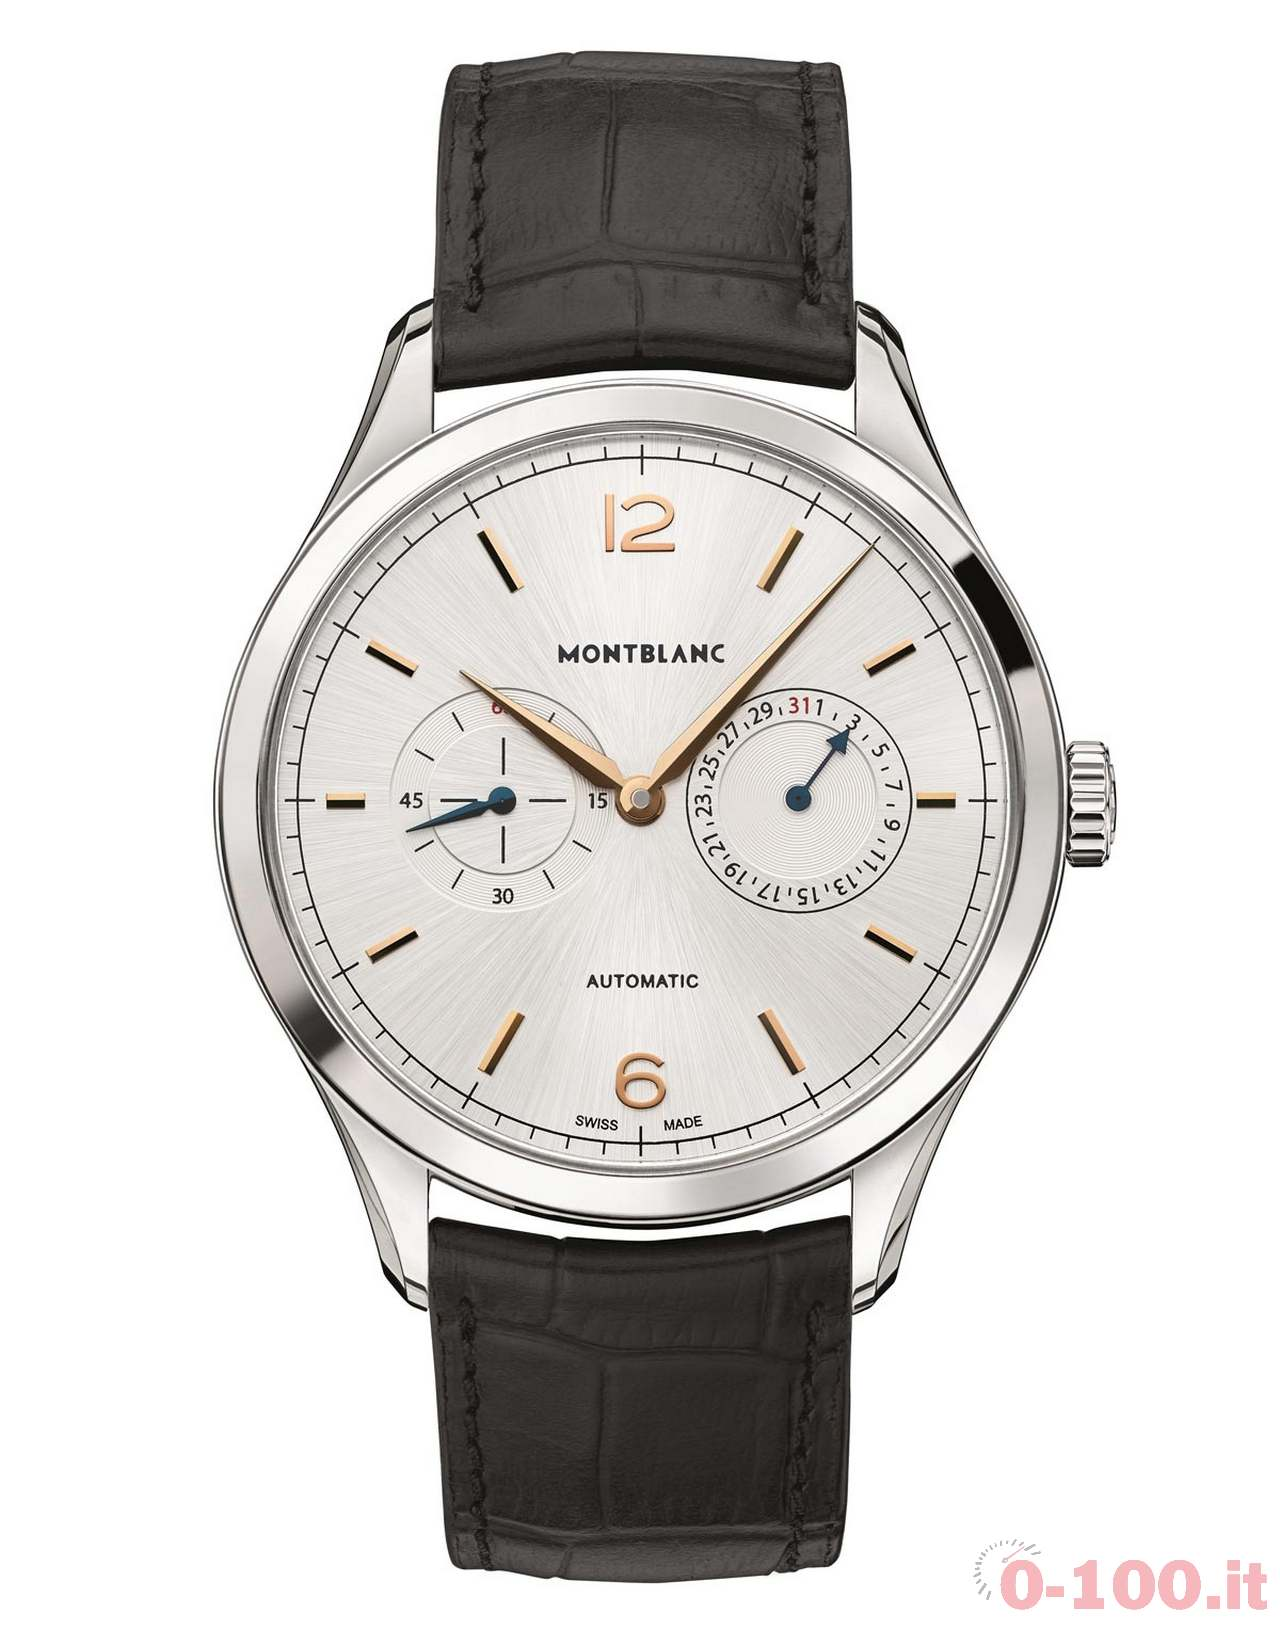 anteprima-sihh-2016-montblanc-heritage-chronometrie-twincounter-date-prezzo-price_0-1003